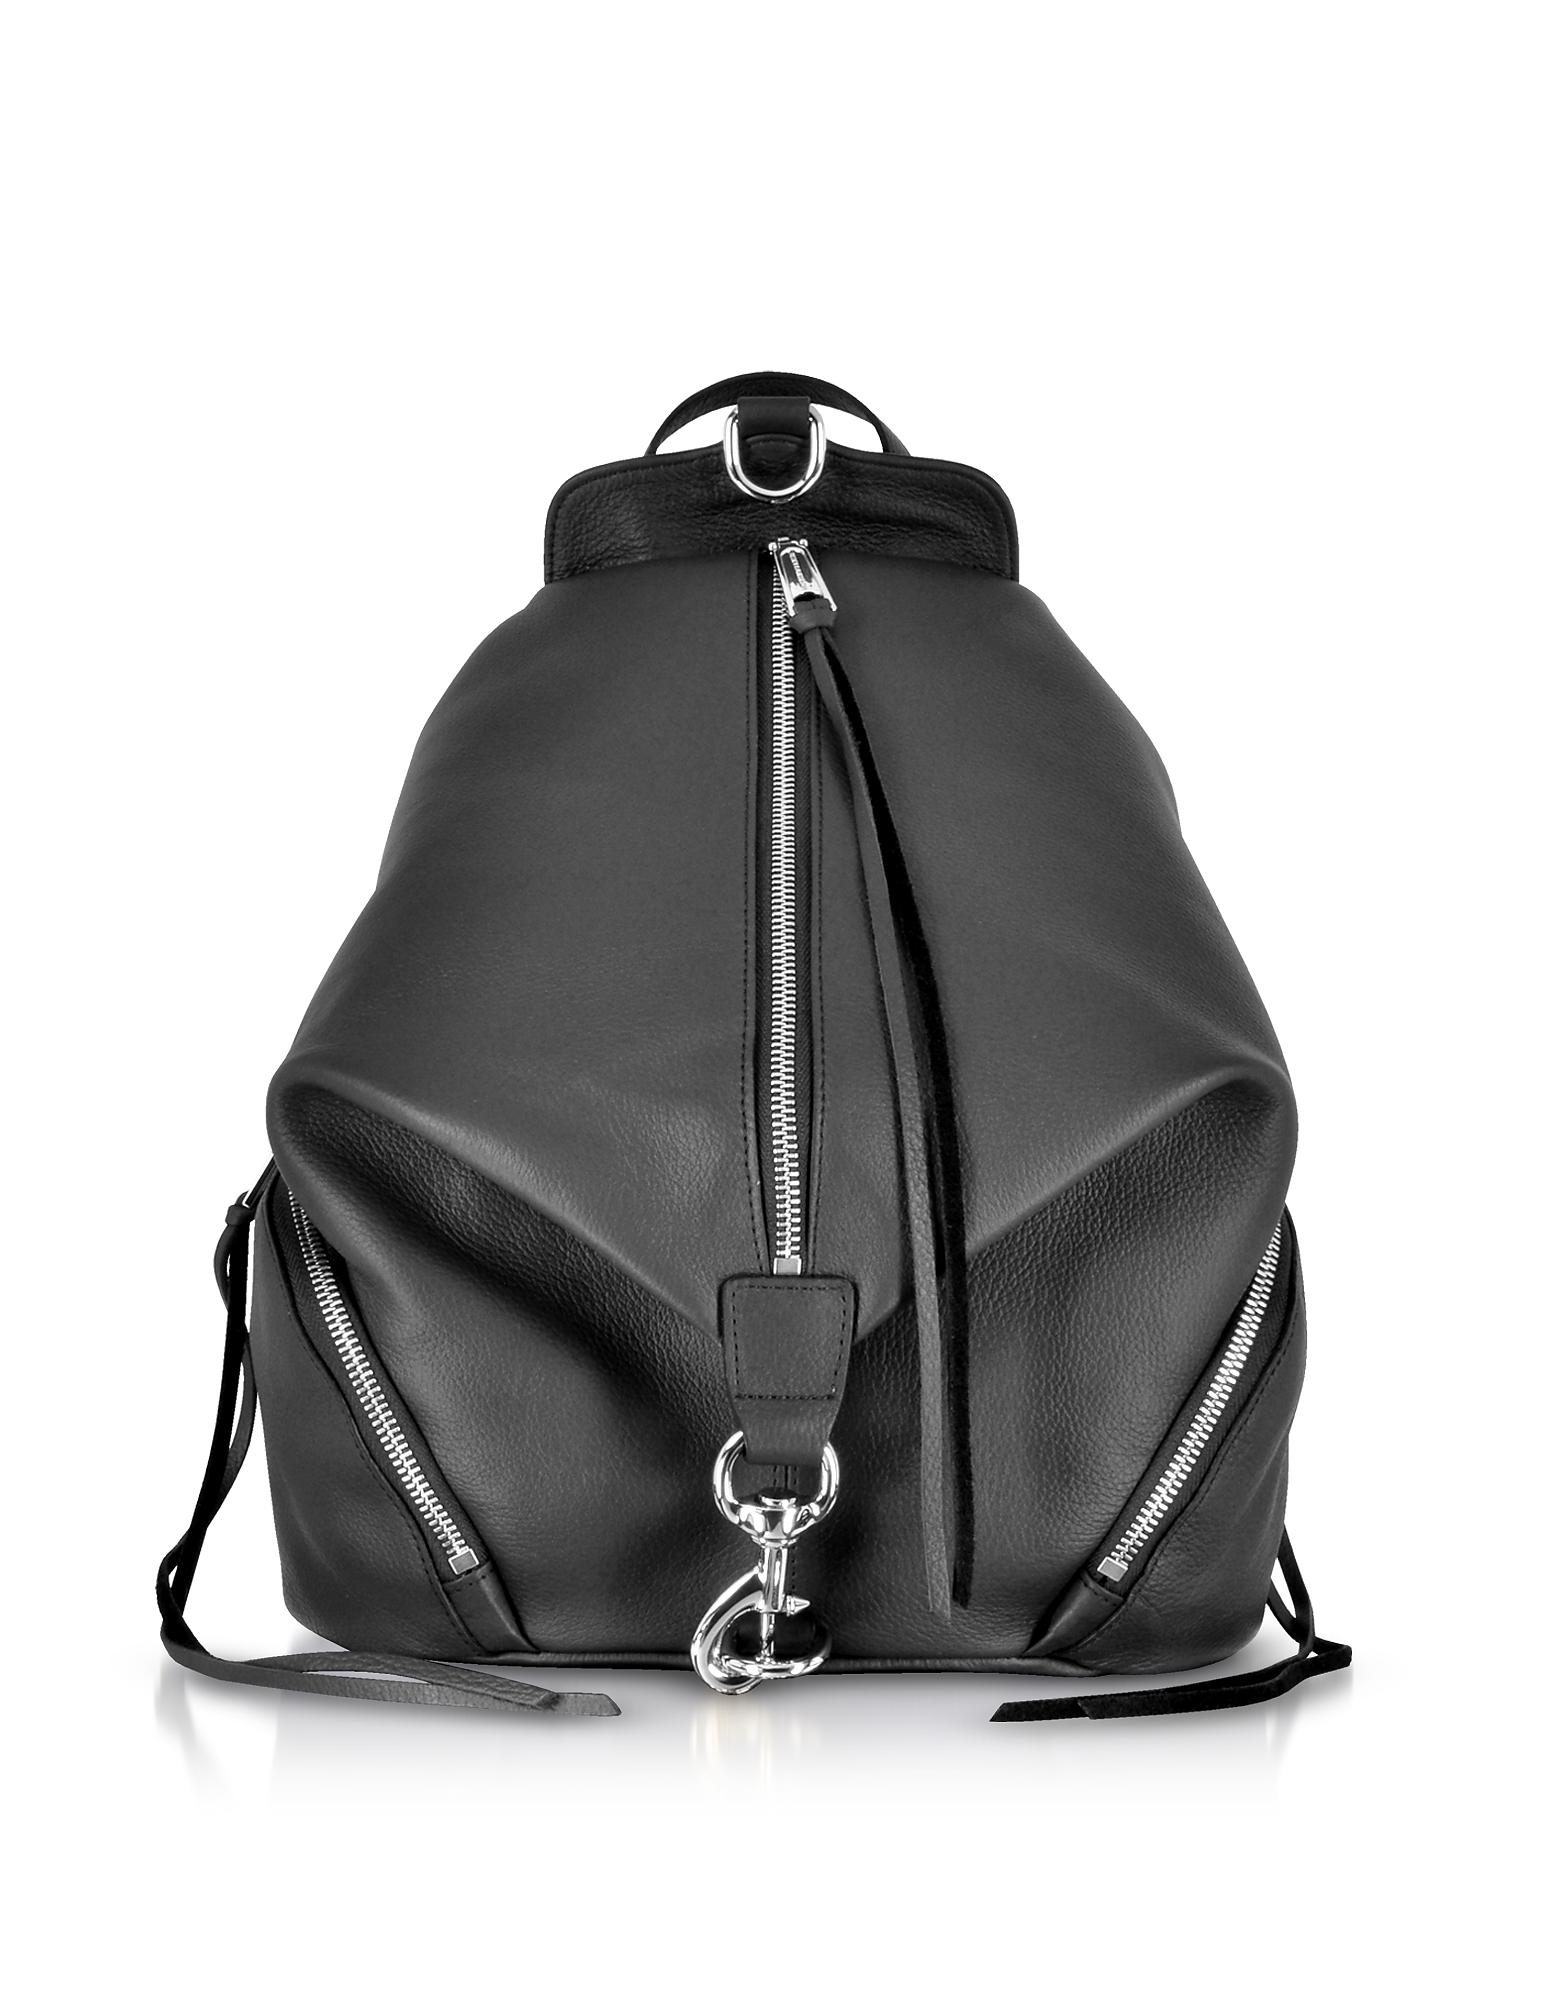 Balck Leather Julian Backpack